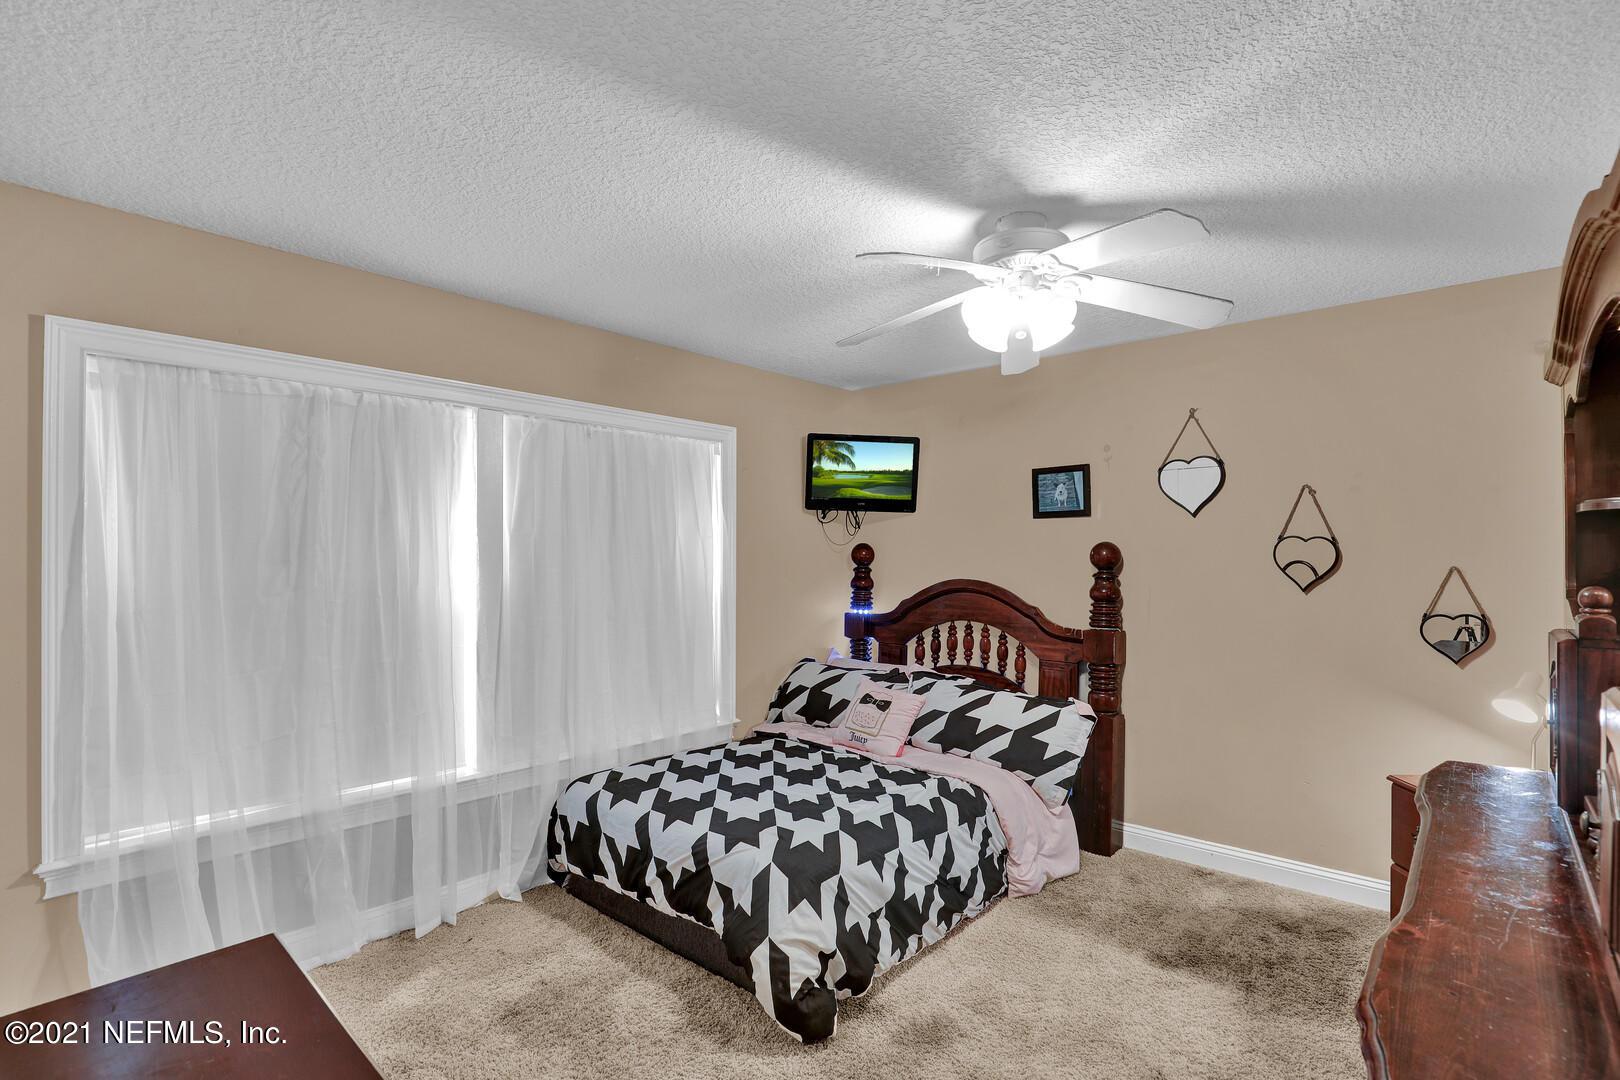 1703 PELICAN, MIDDLEBURG, FLORIDA 32068, 4 Bedrooms Bedrooms, ,2 BathroomsBathrooms,Residential,For sale,PELICAN,1104898